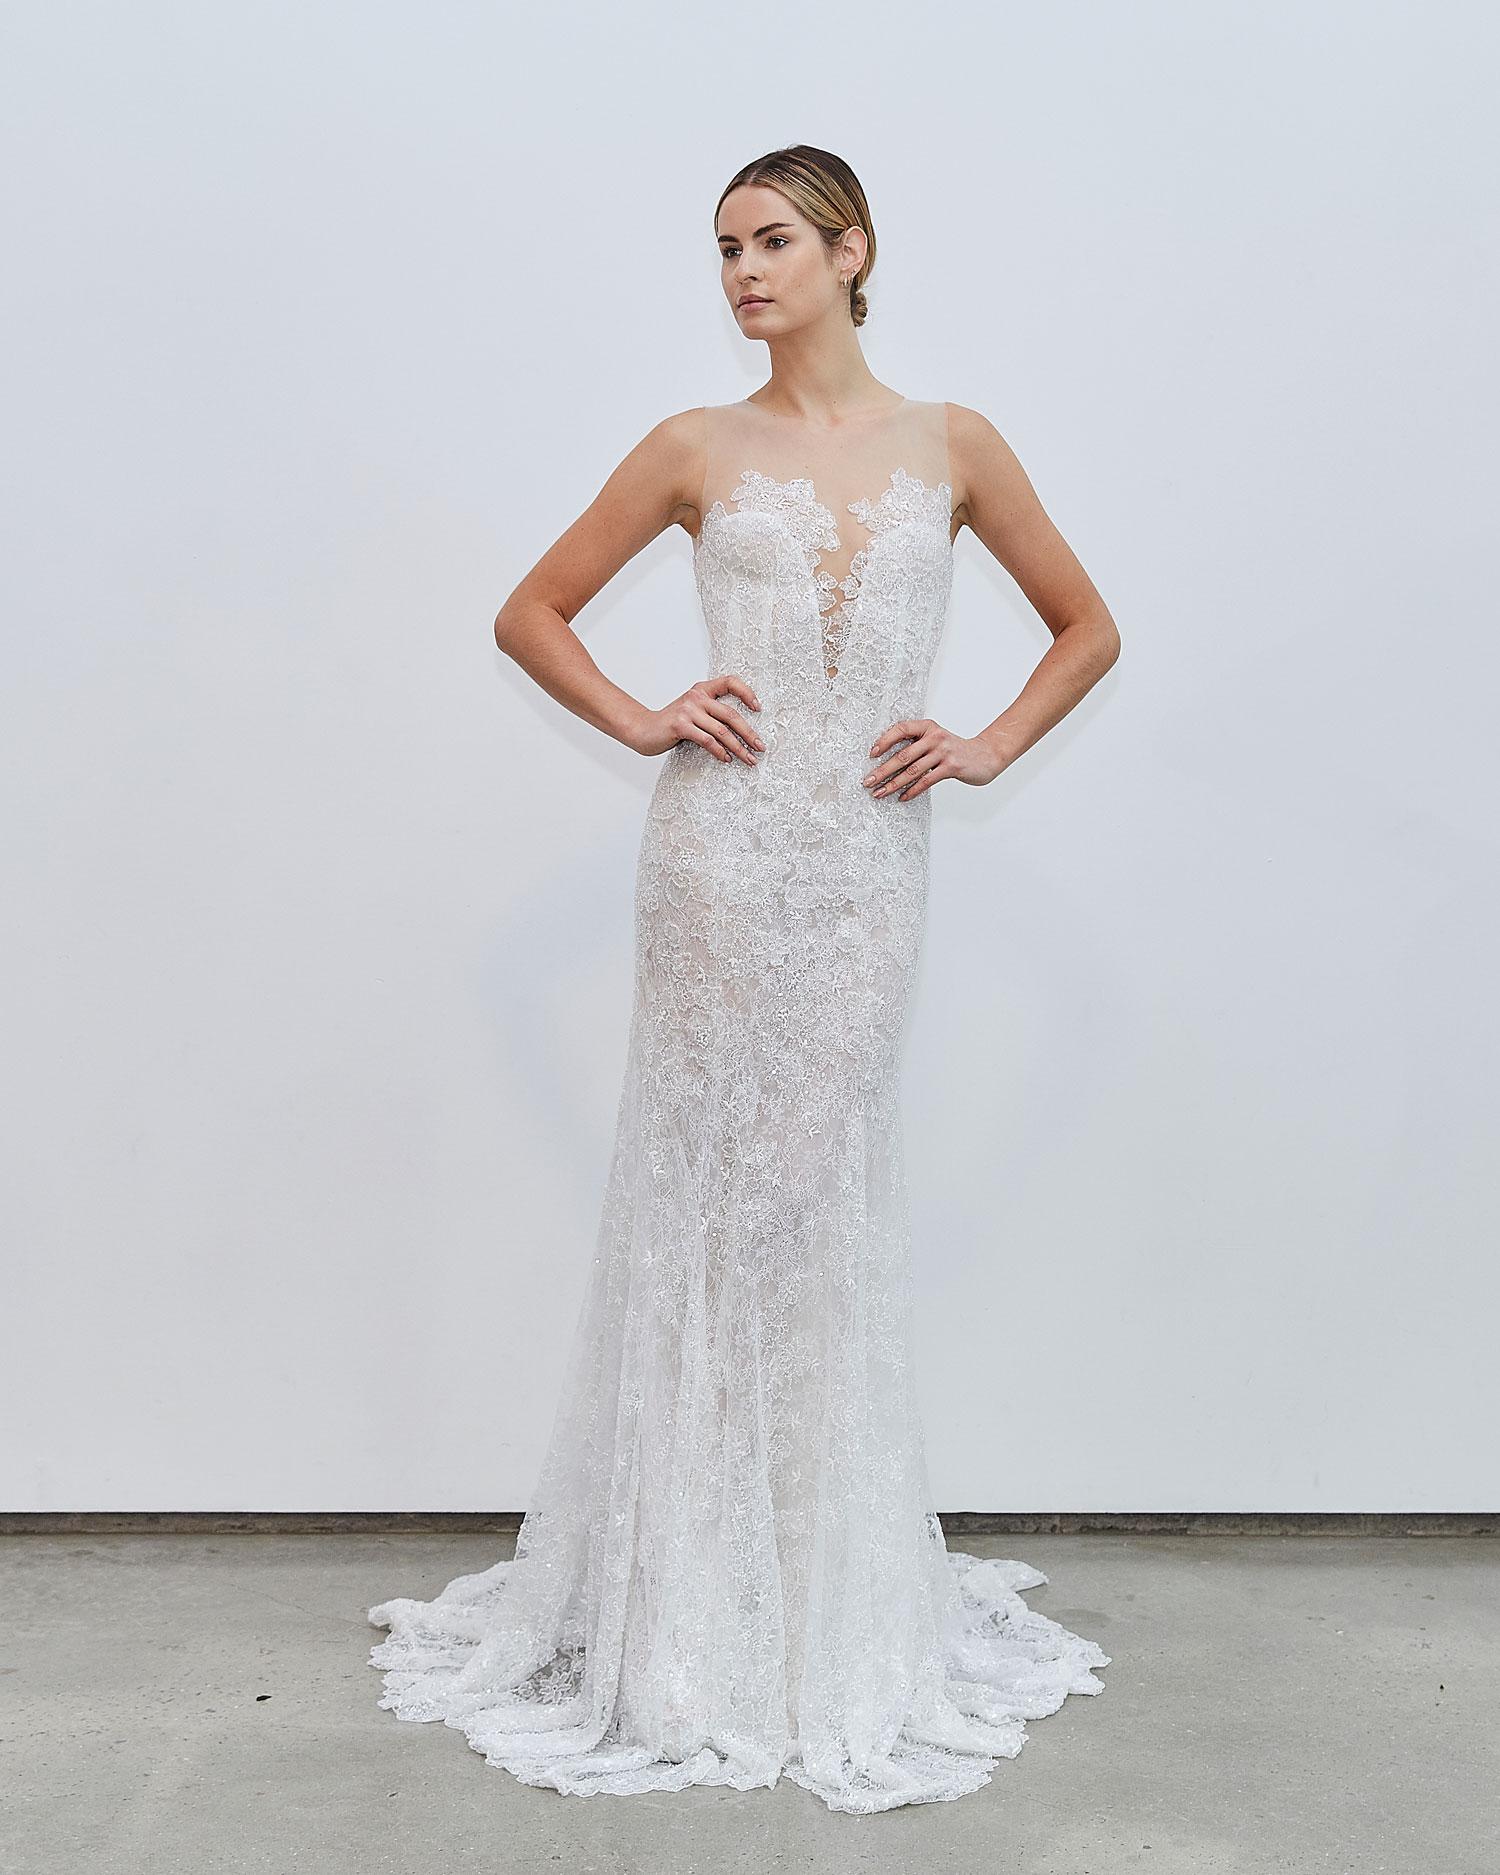 Francesca Miranda Fall 2020 bridal collection Danielle sleeveless lace wedding dress illusion neckline